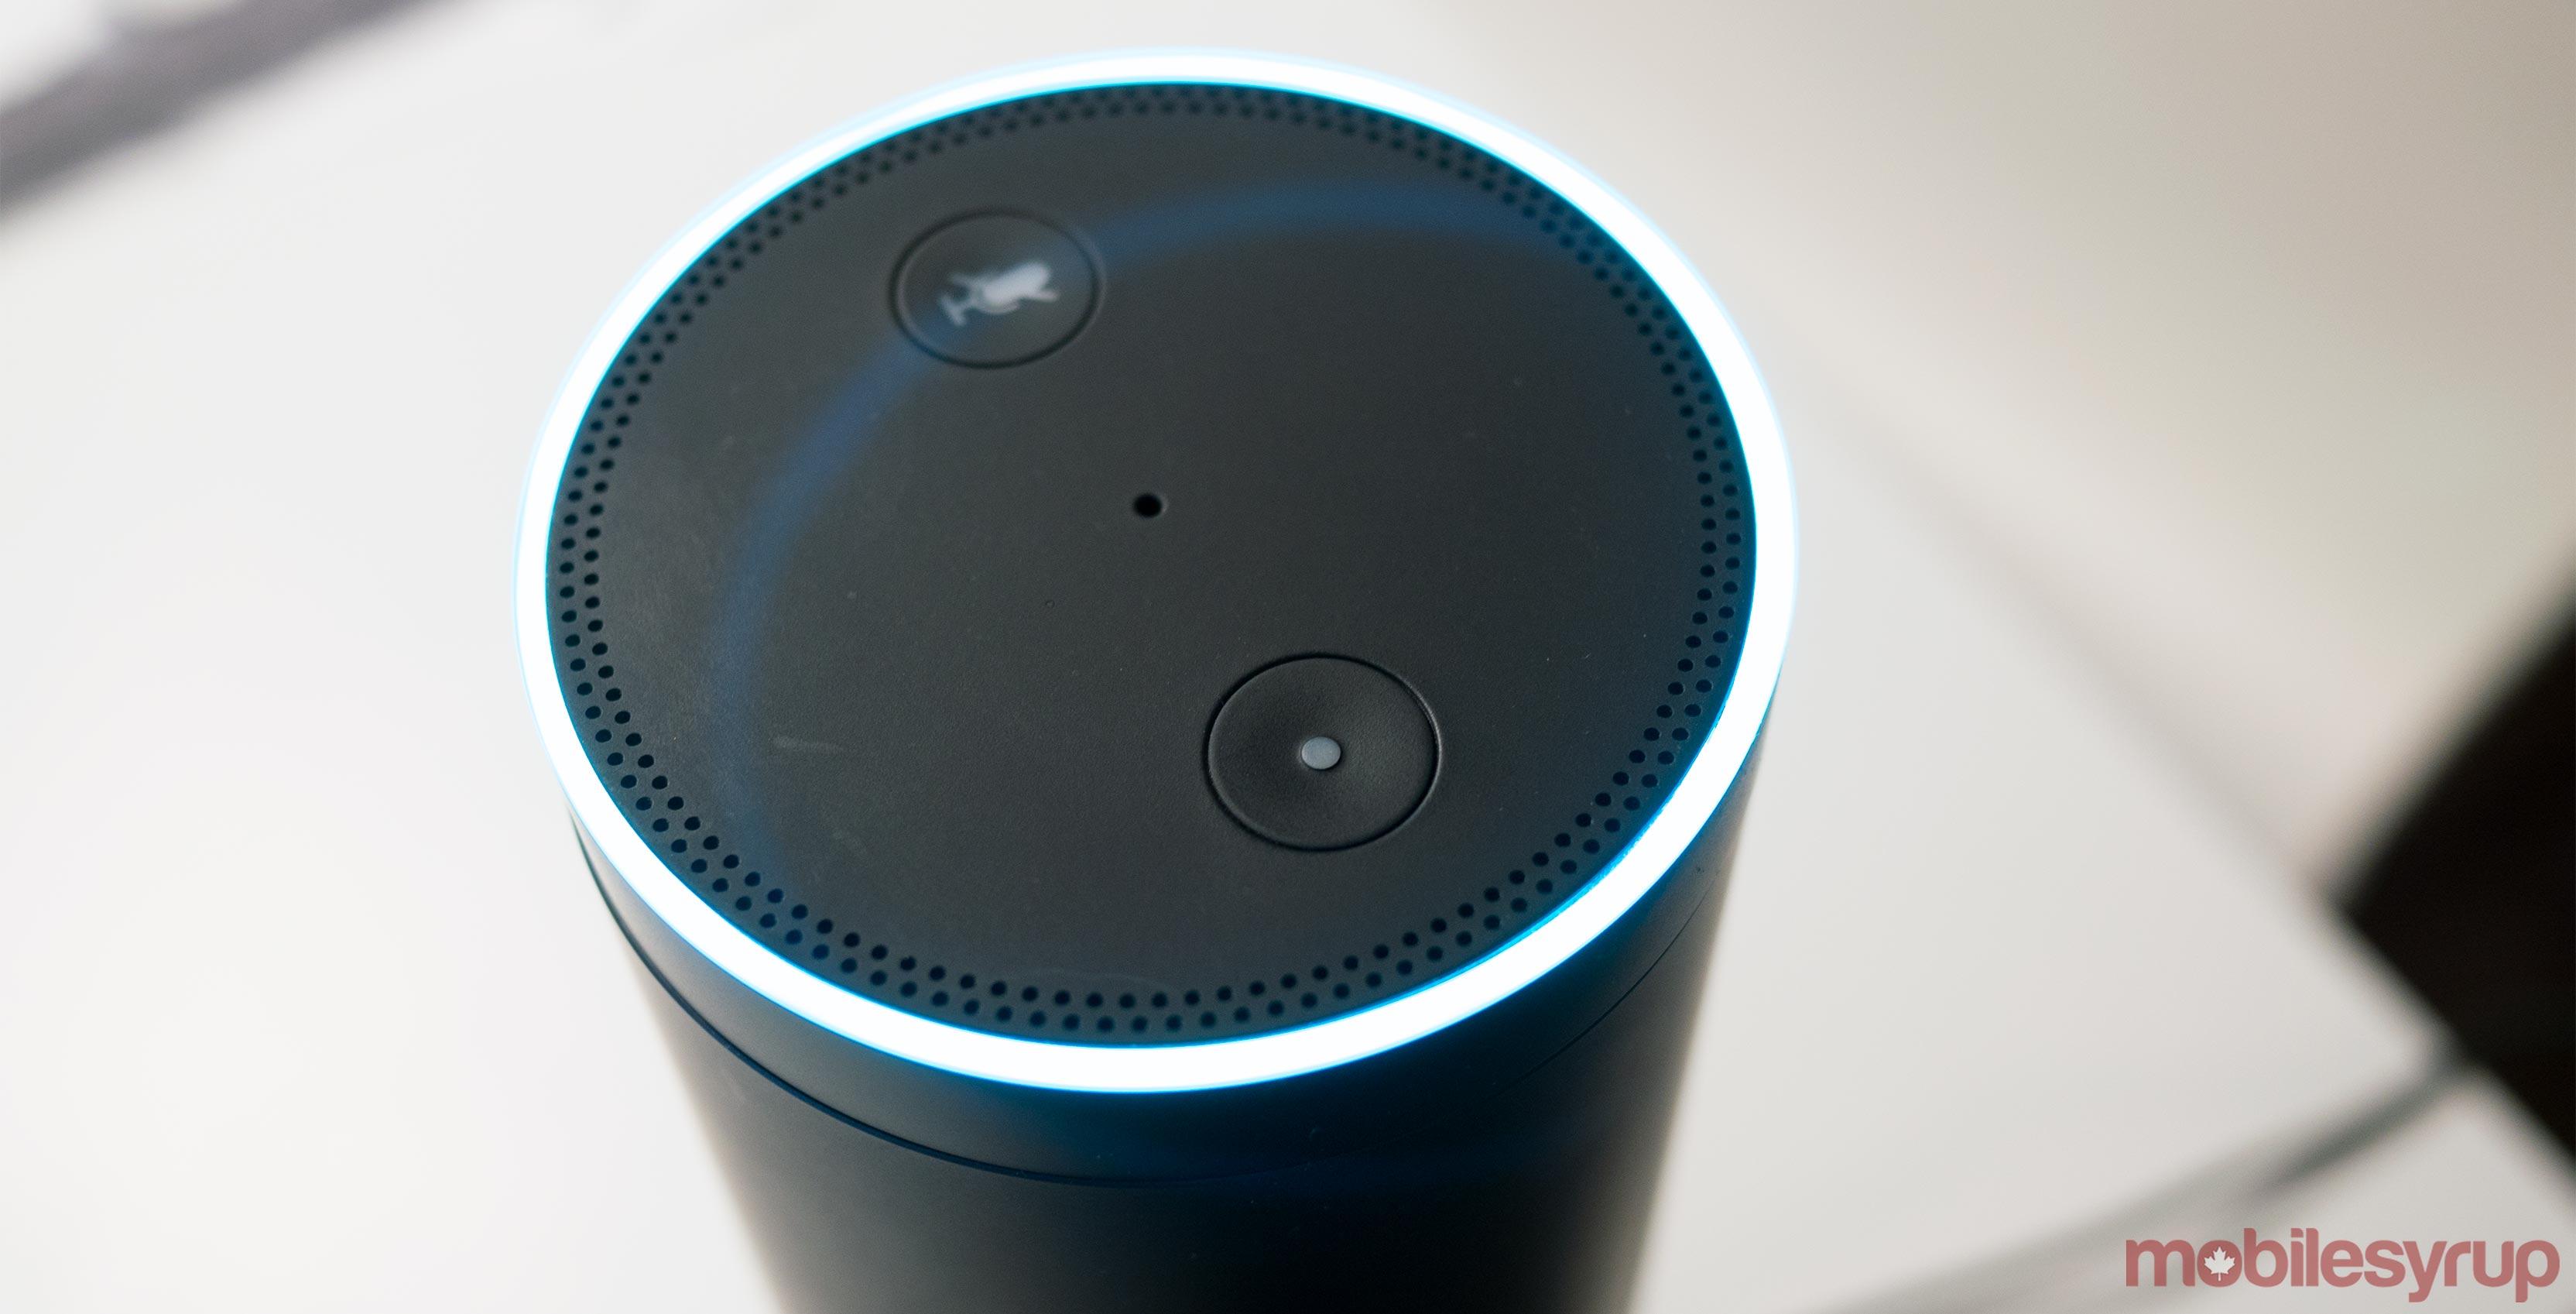 voice activated assistants Amazon Alexa